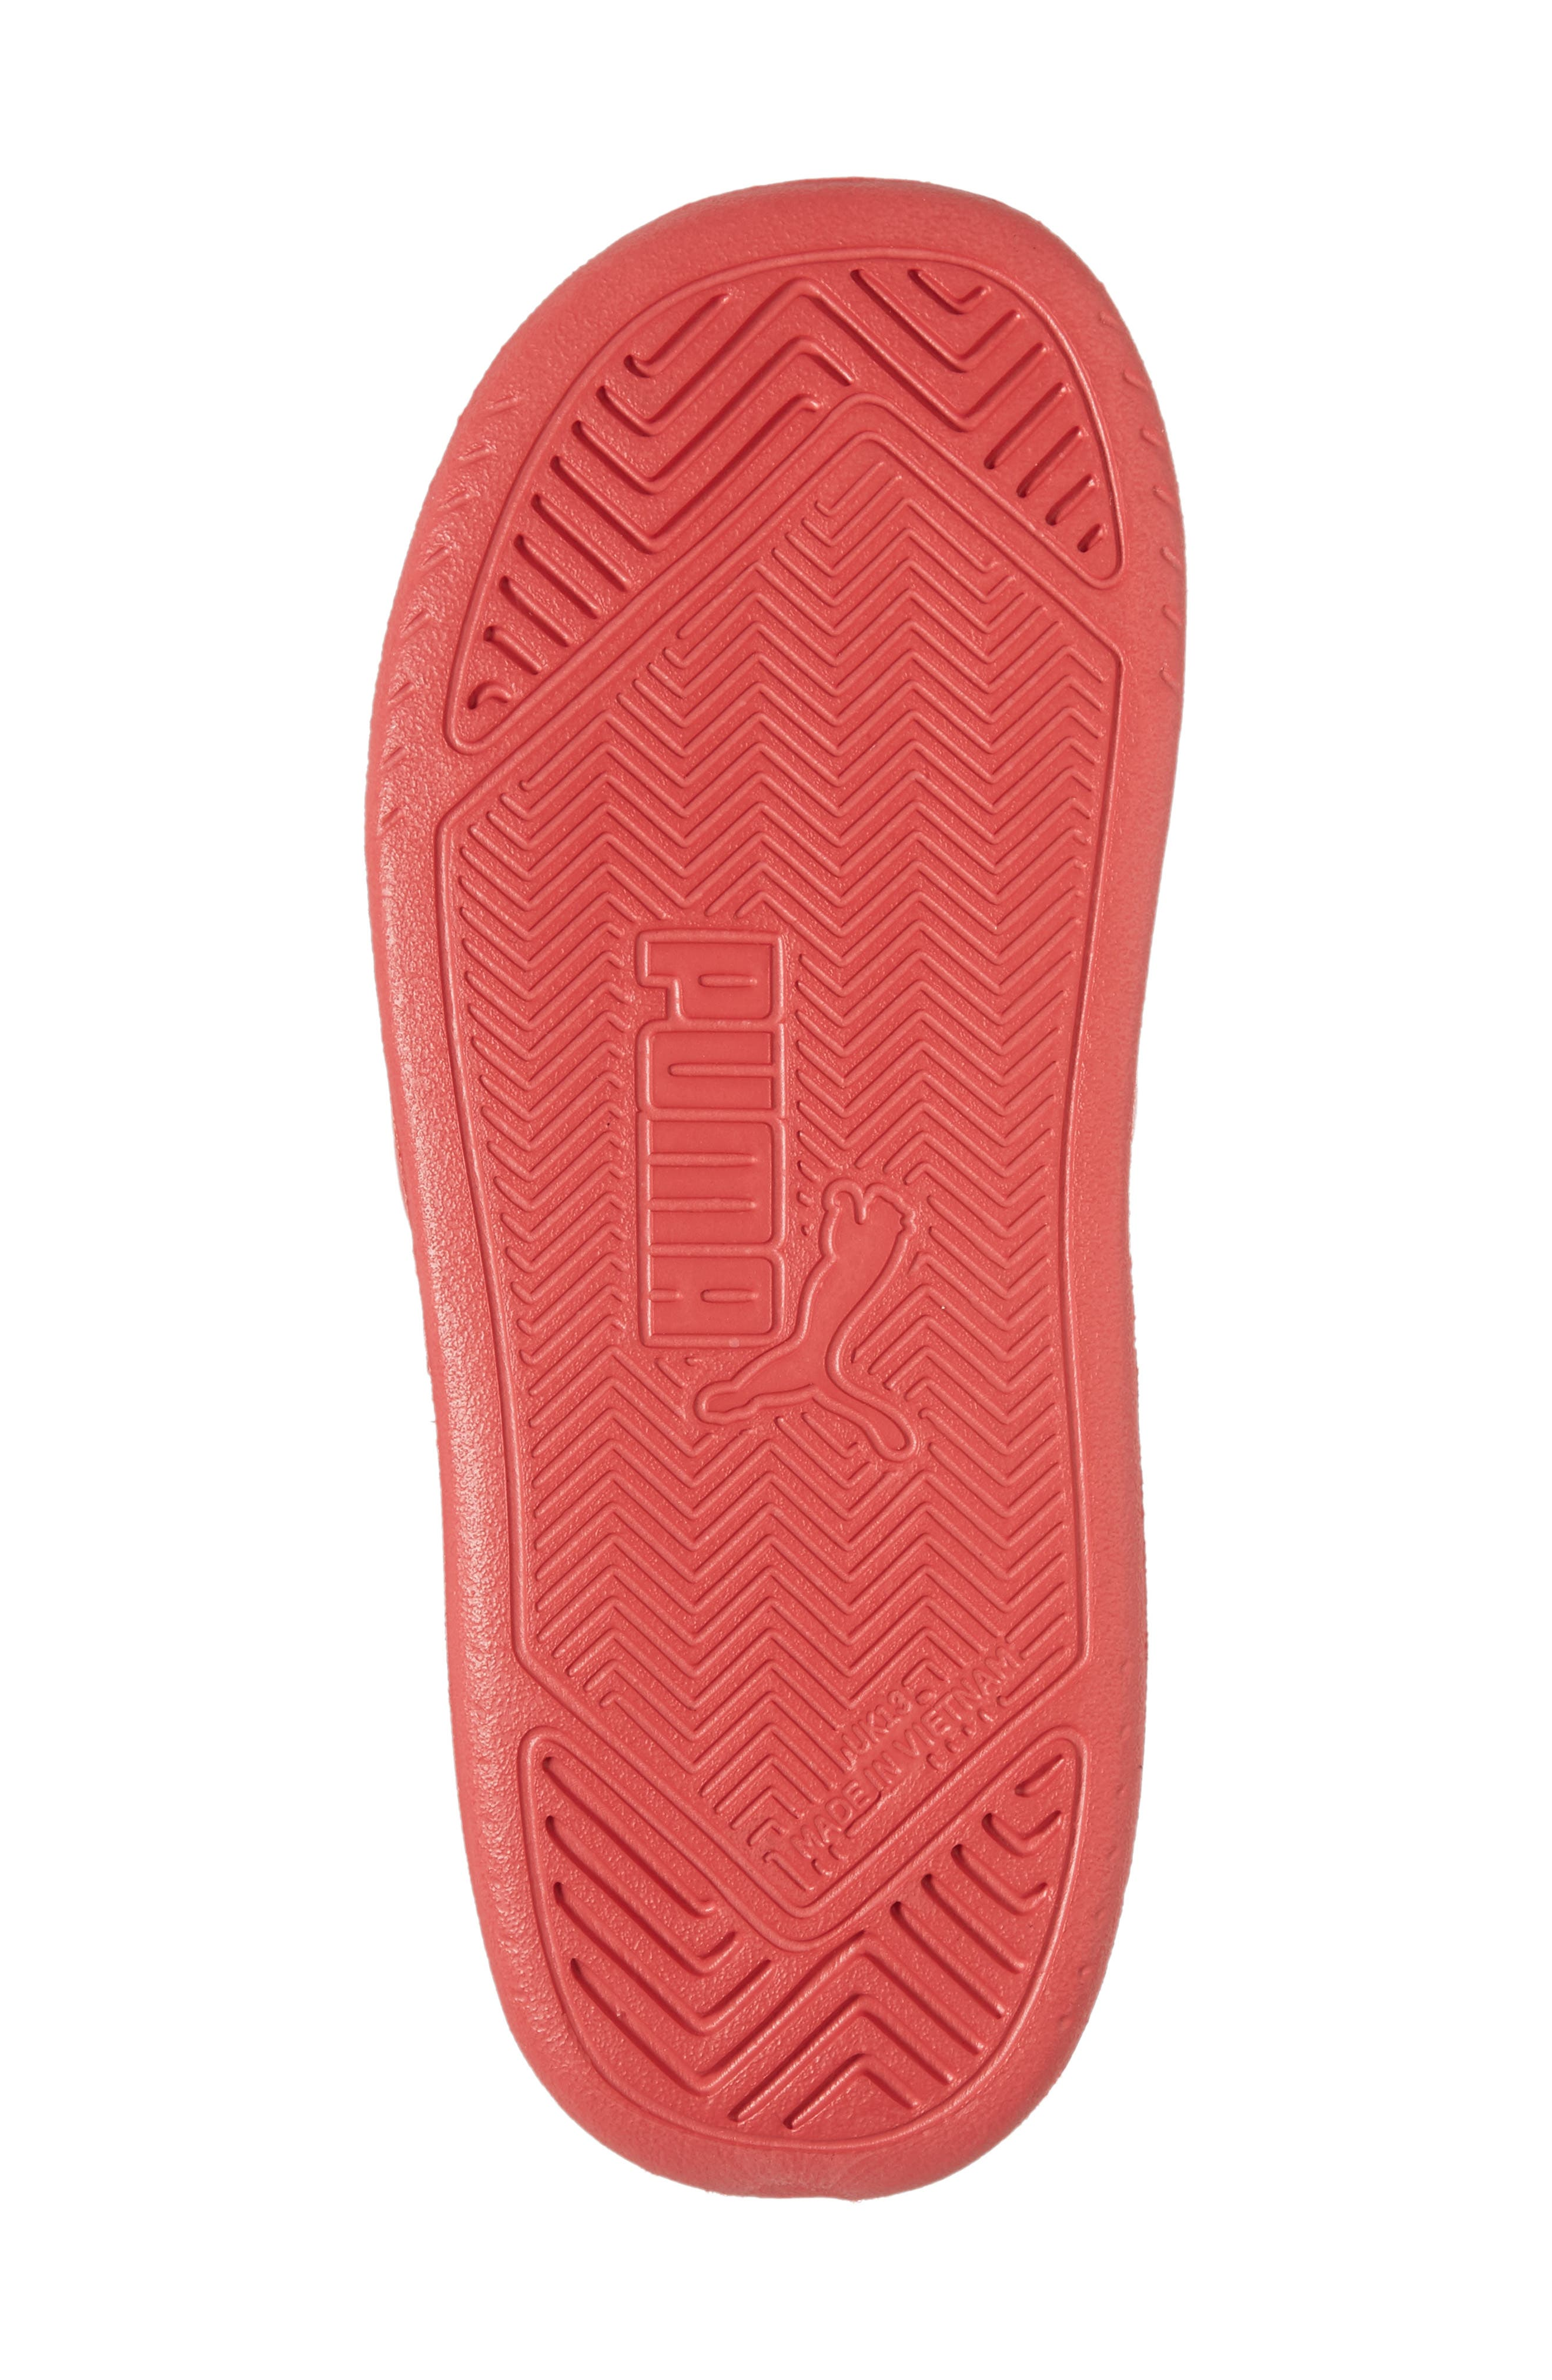 Popcat Slide Sandal,                             Alternate thumbnail 6, color,                             Paradise Pink/ Pearl